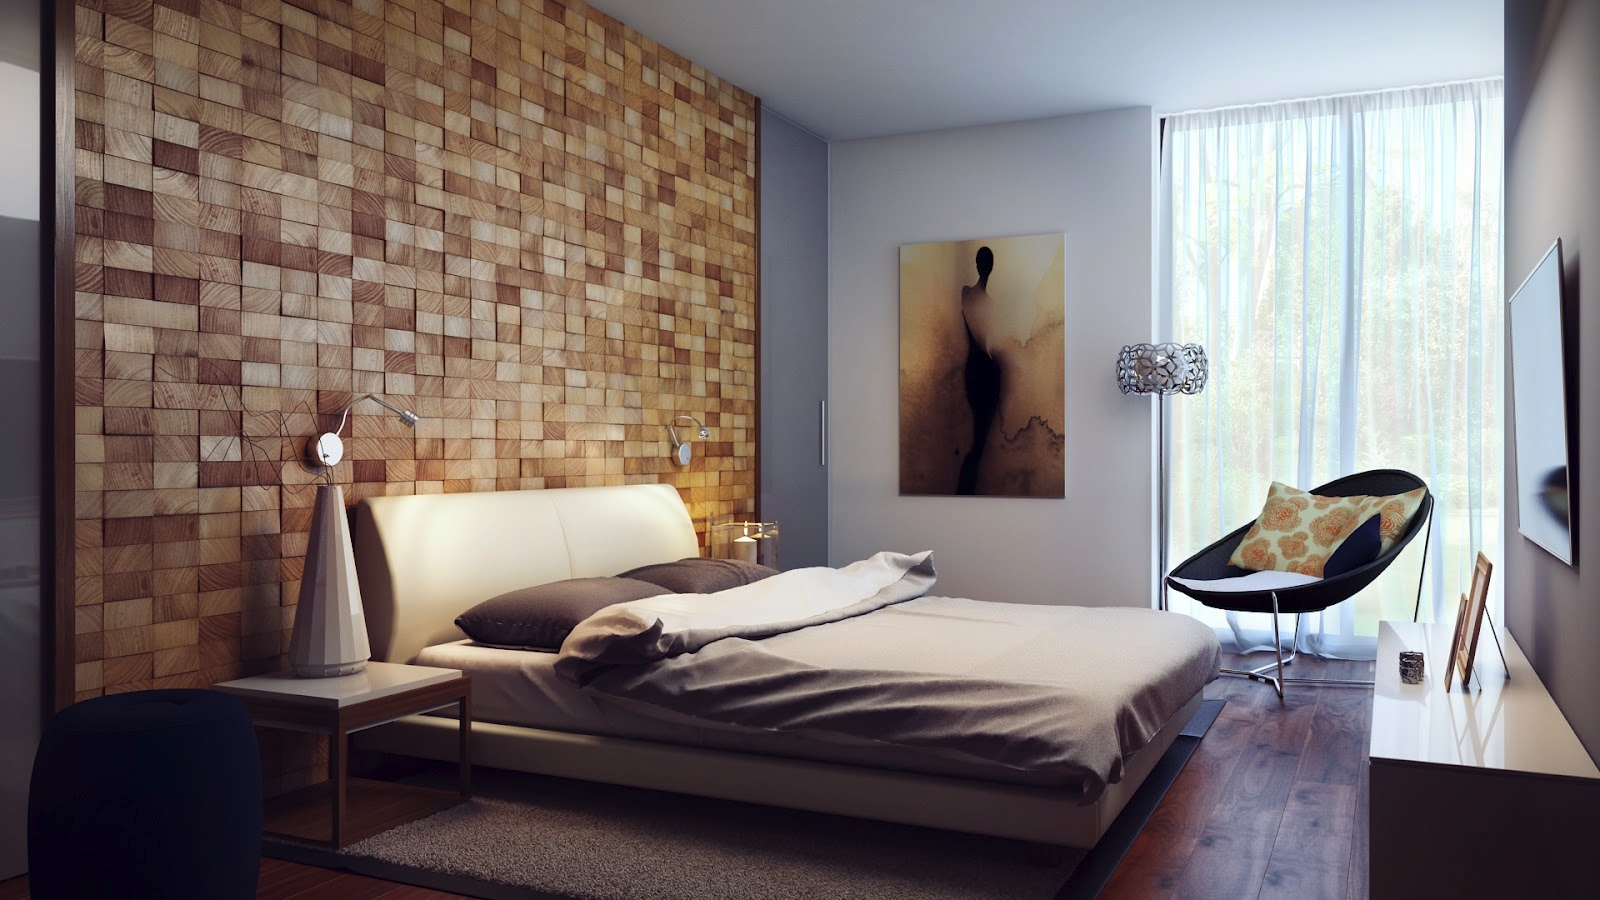 CUSTOM Bed Headboards - Any design u give, we will make it !